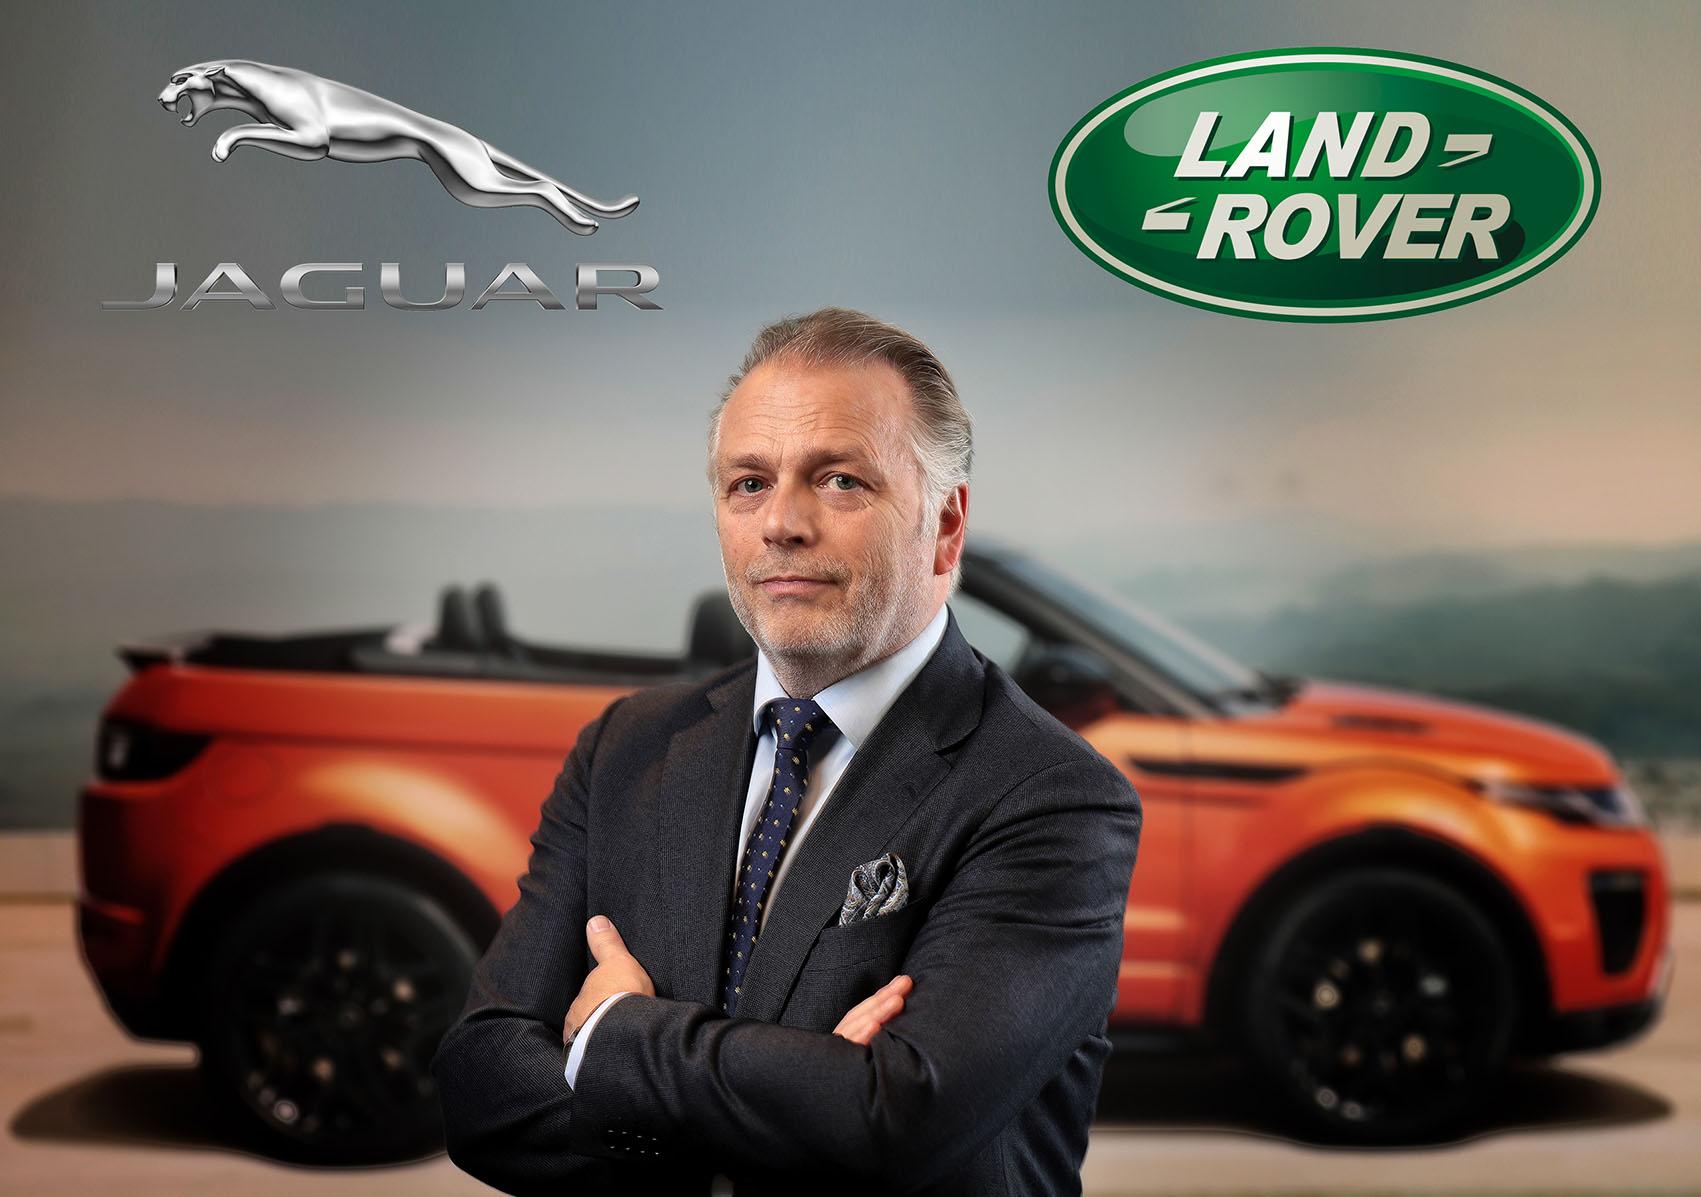 Jaguar Land Rover Norge